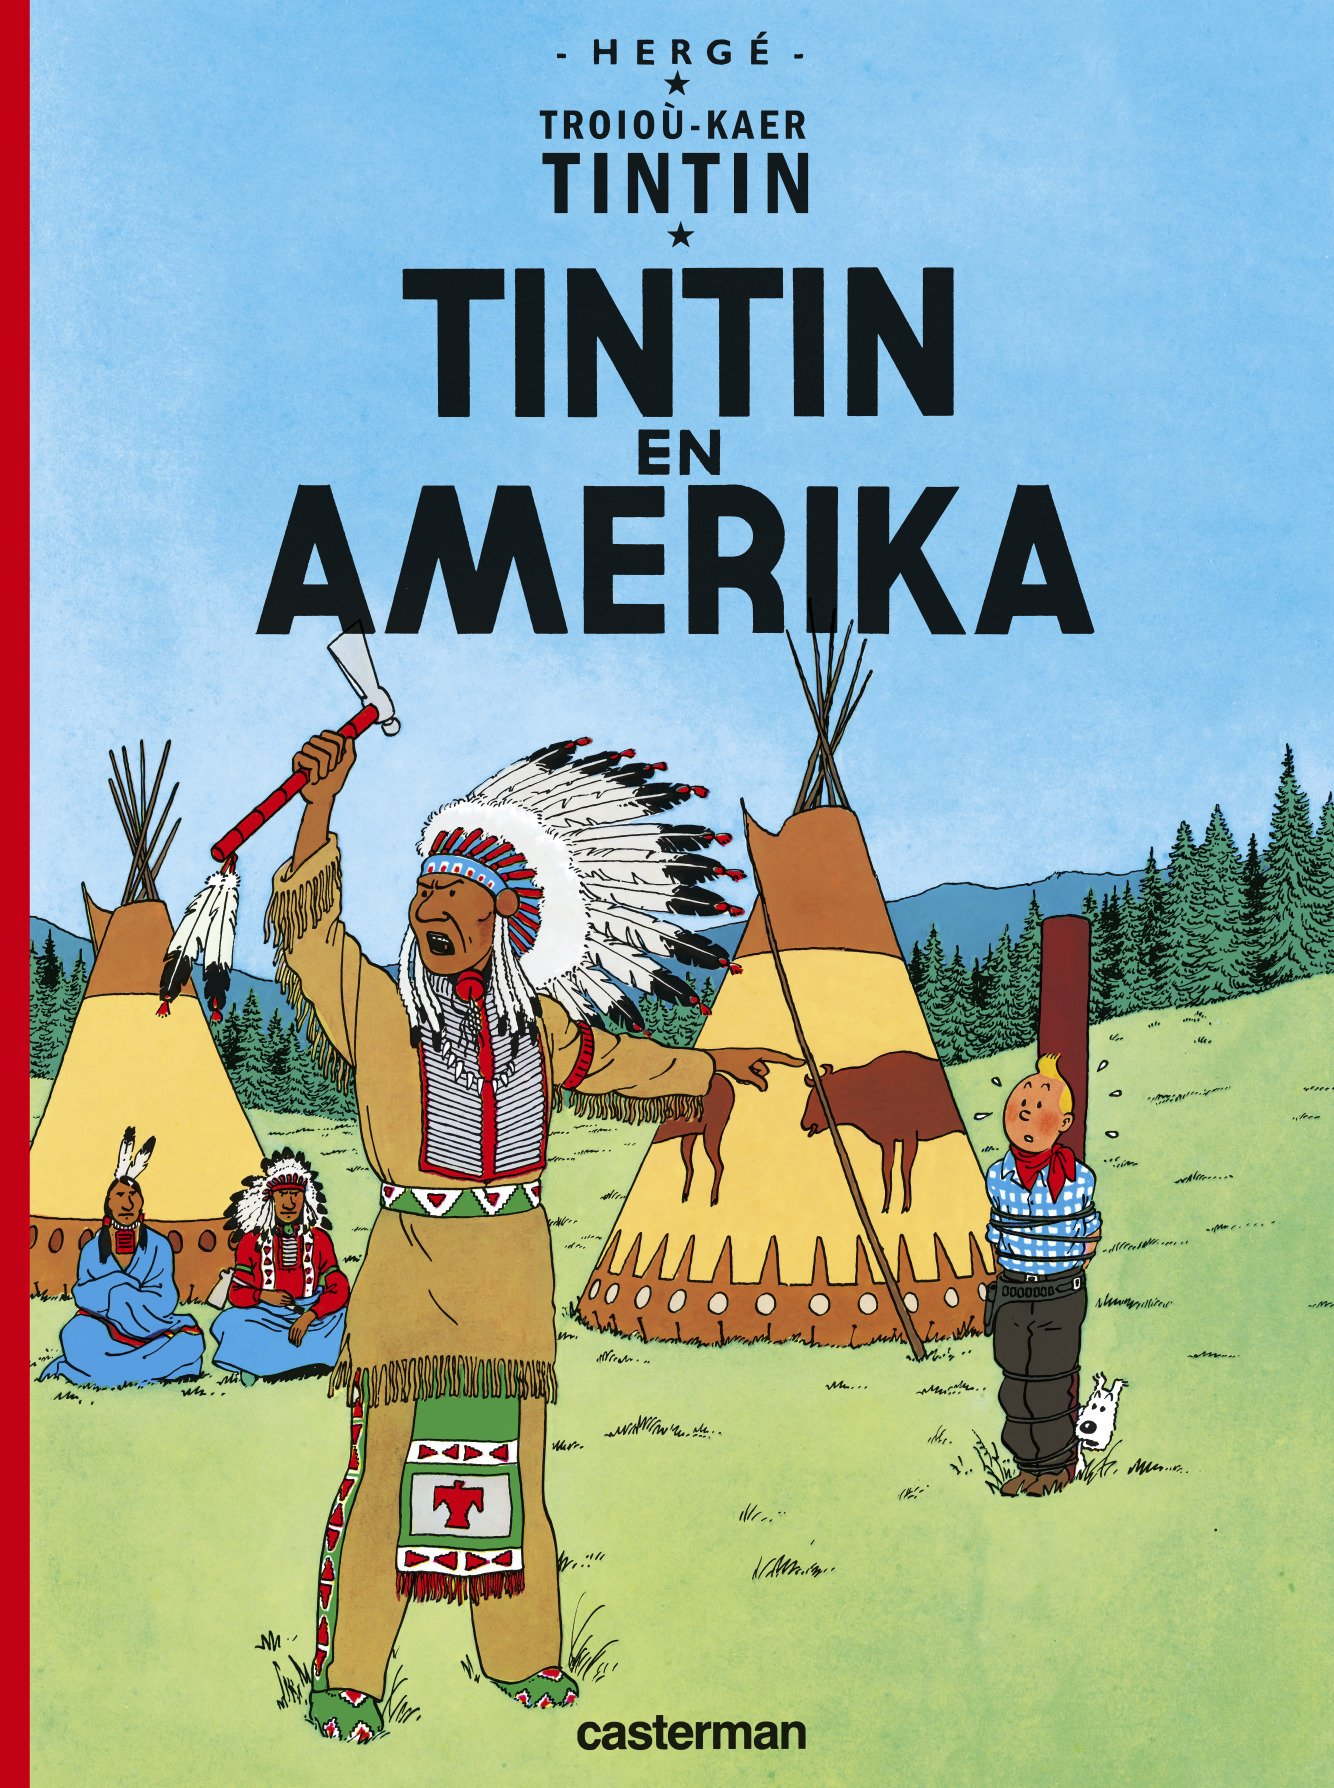 Tintin (Les aventures de) 3 - Tintin en Amerika